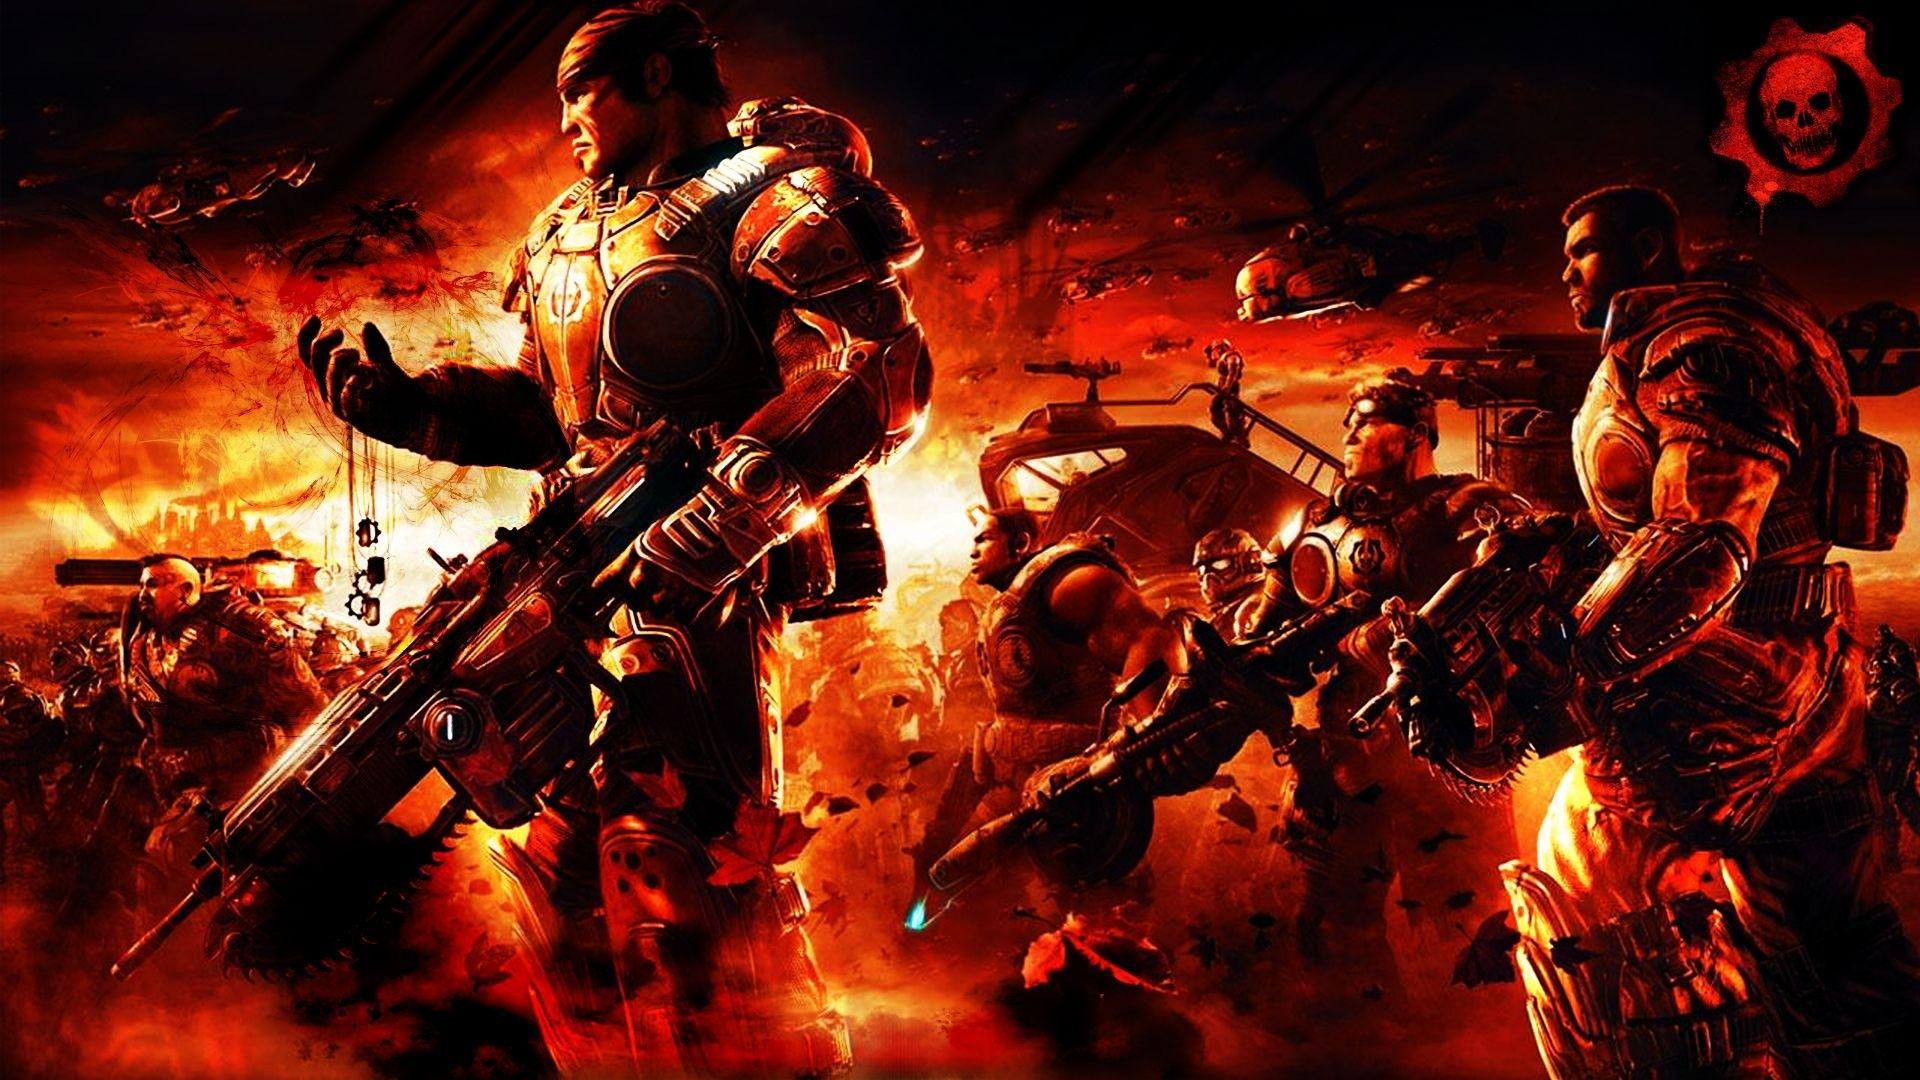 games: gears of war 2, desktop wallpaper nr. 54464stiannius